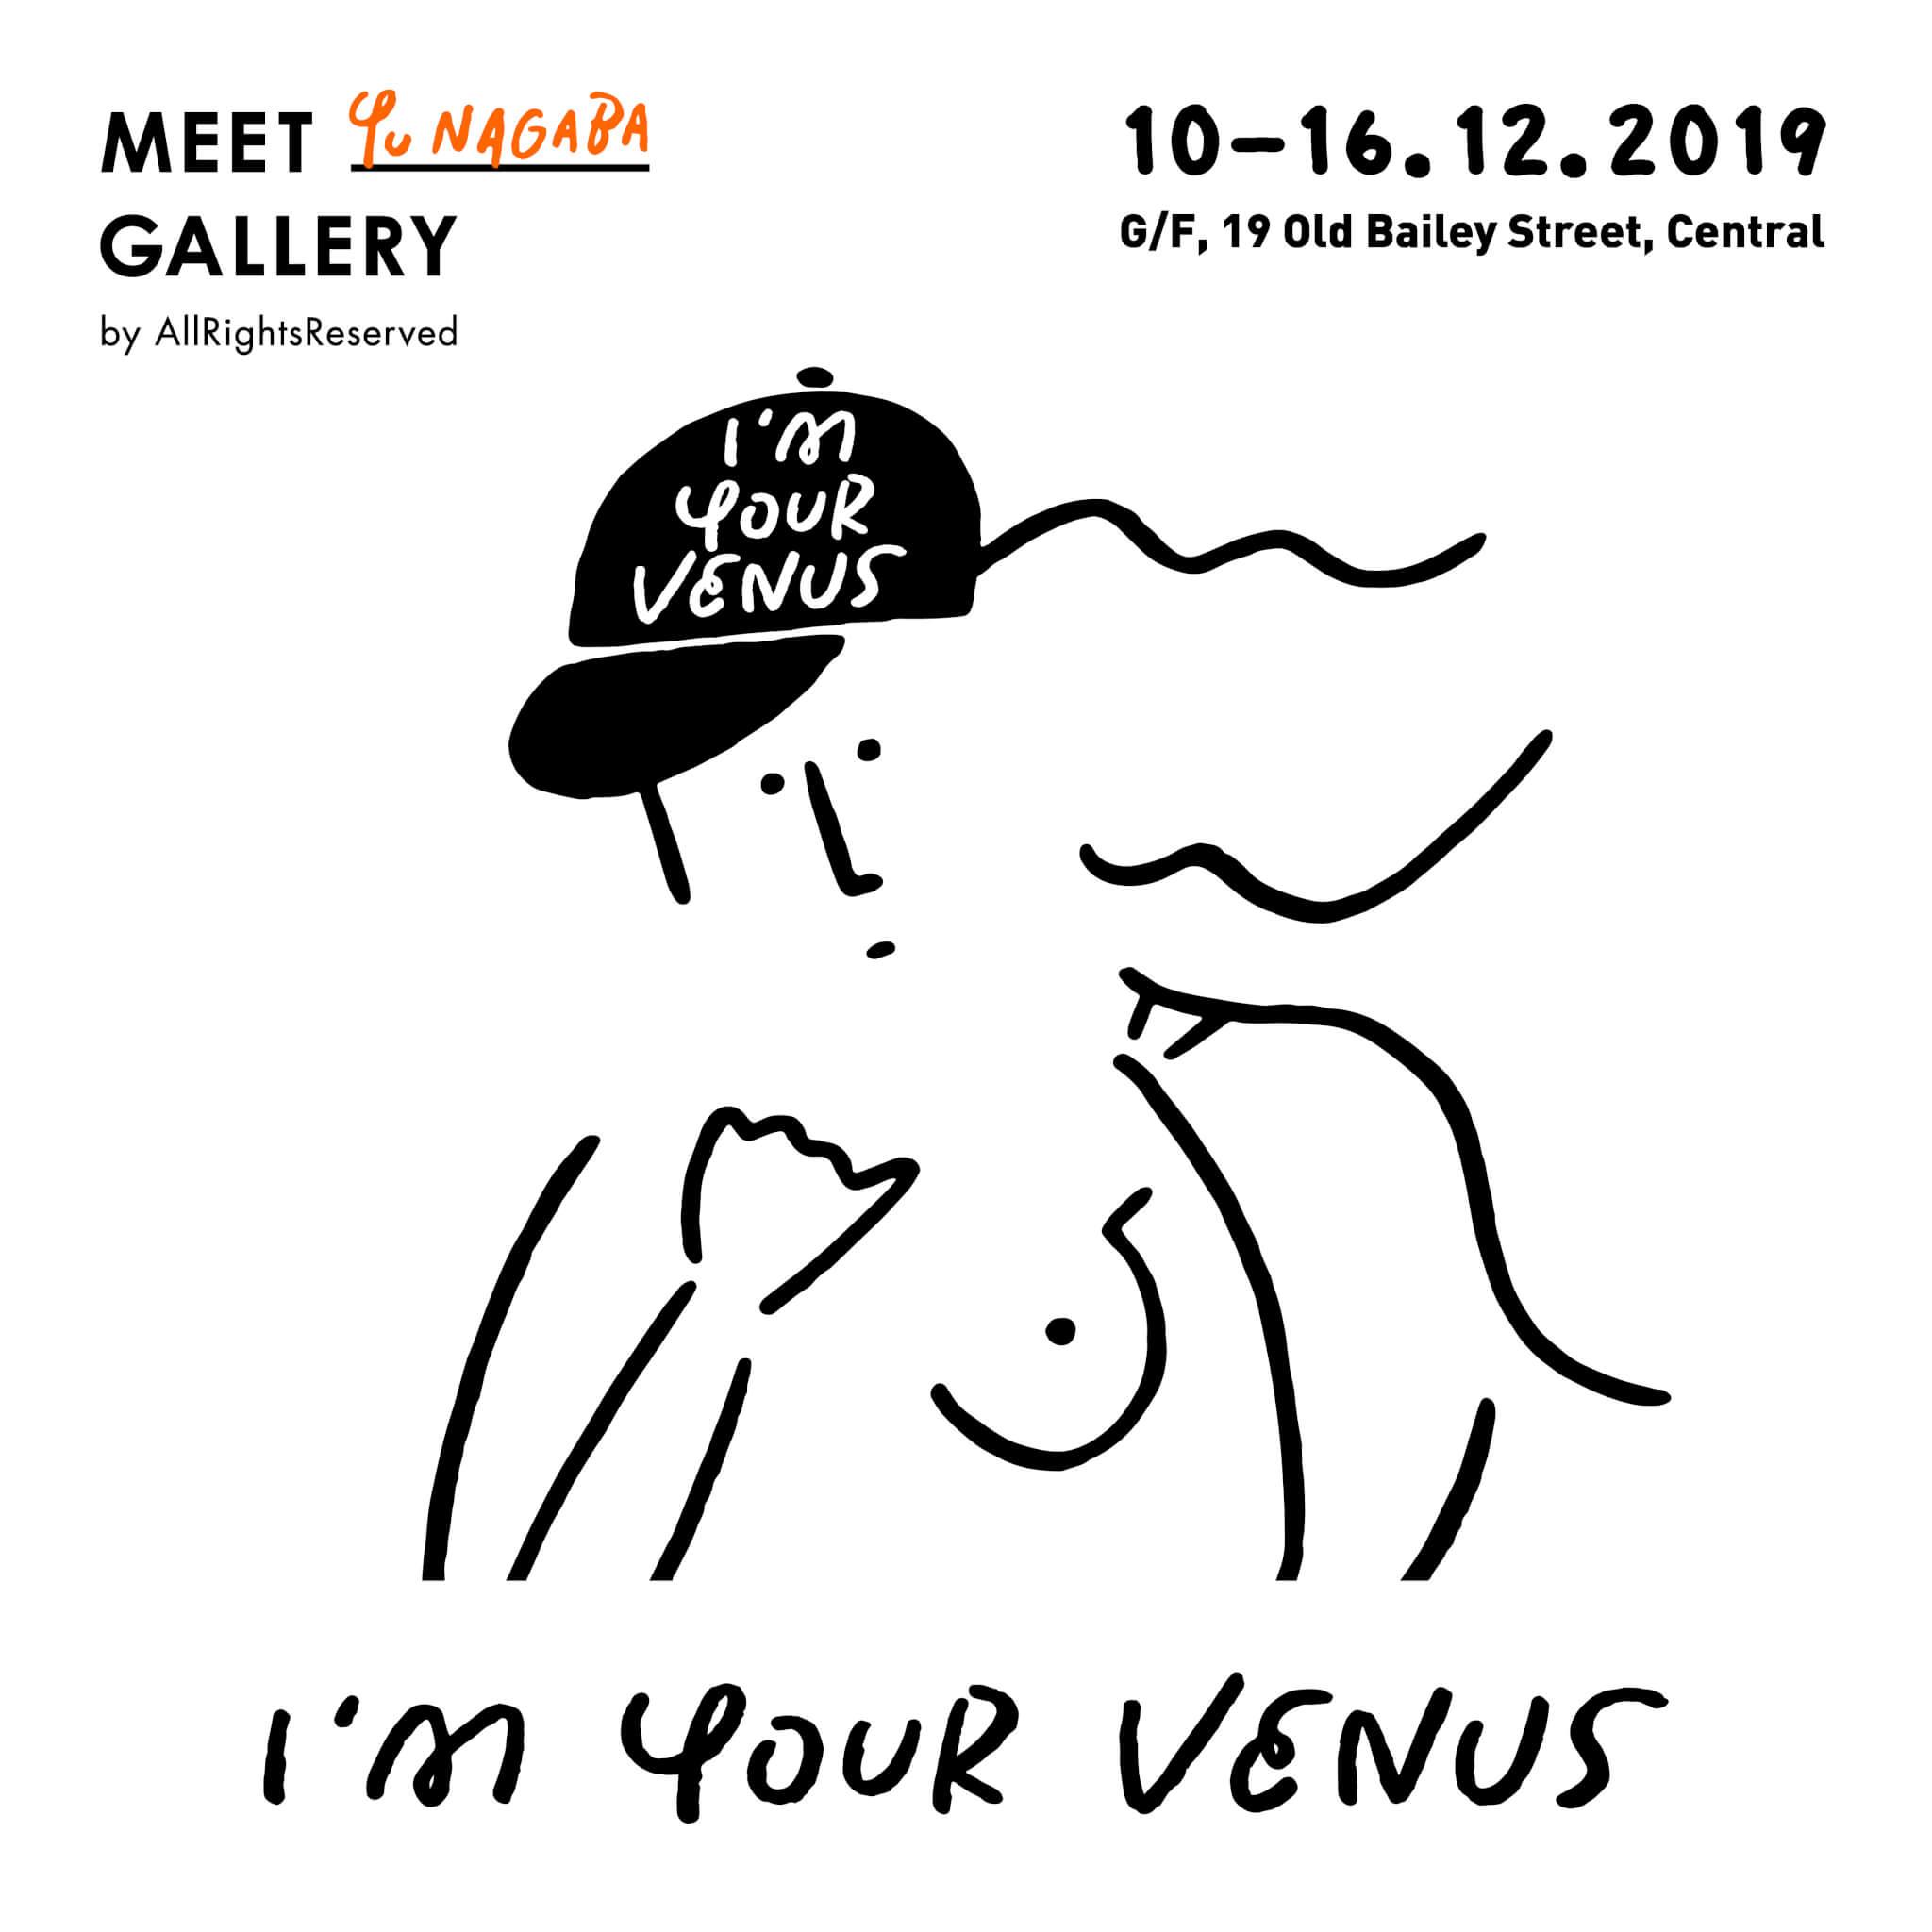 01a_meet_project_im-your-venus_key-visual